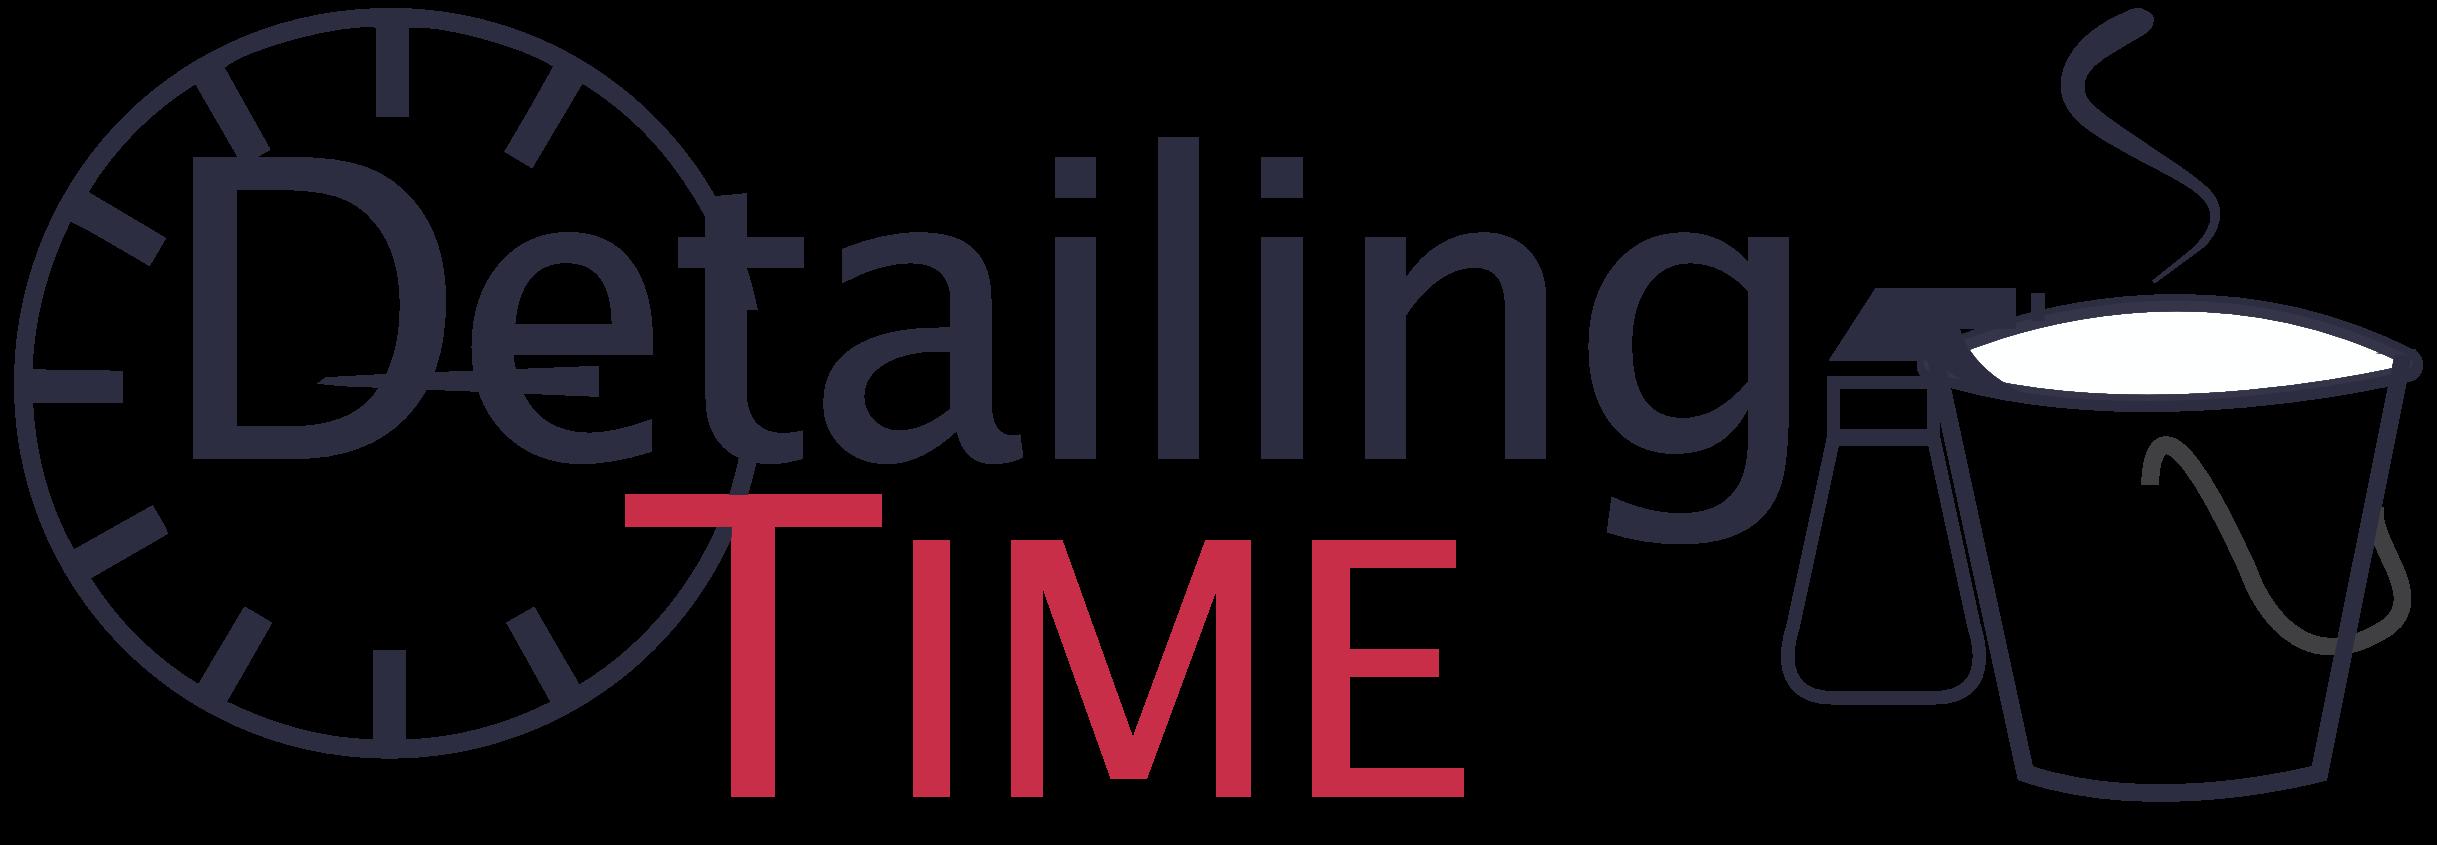 Detailing-Time